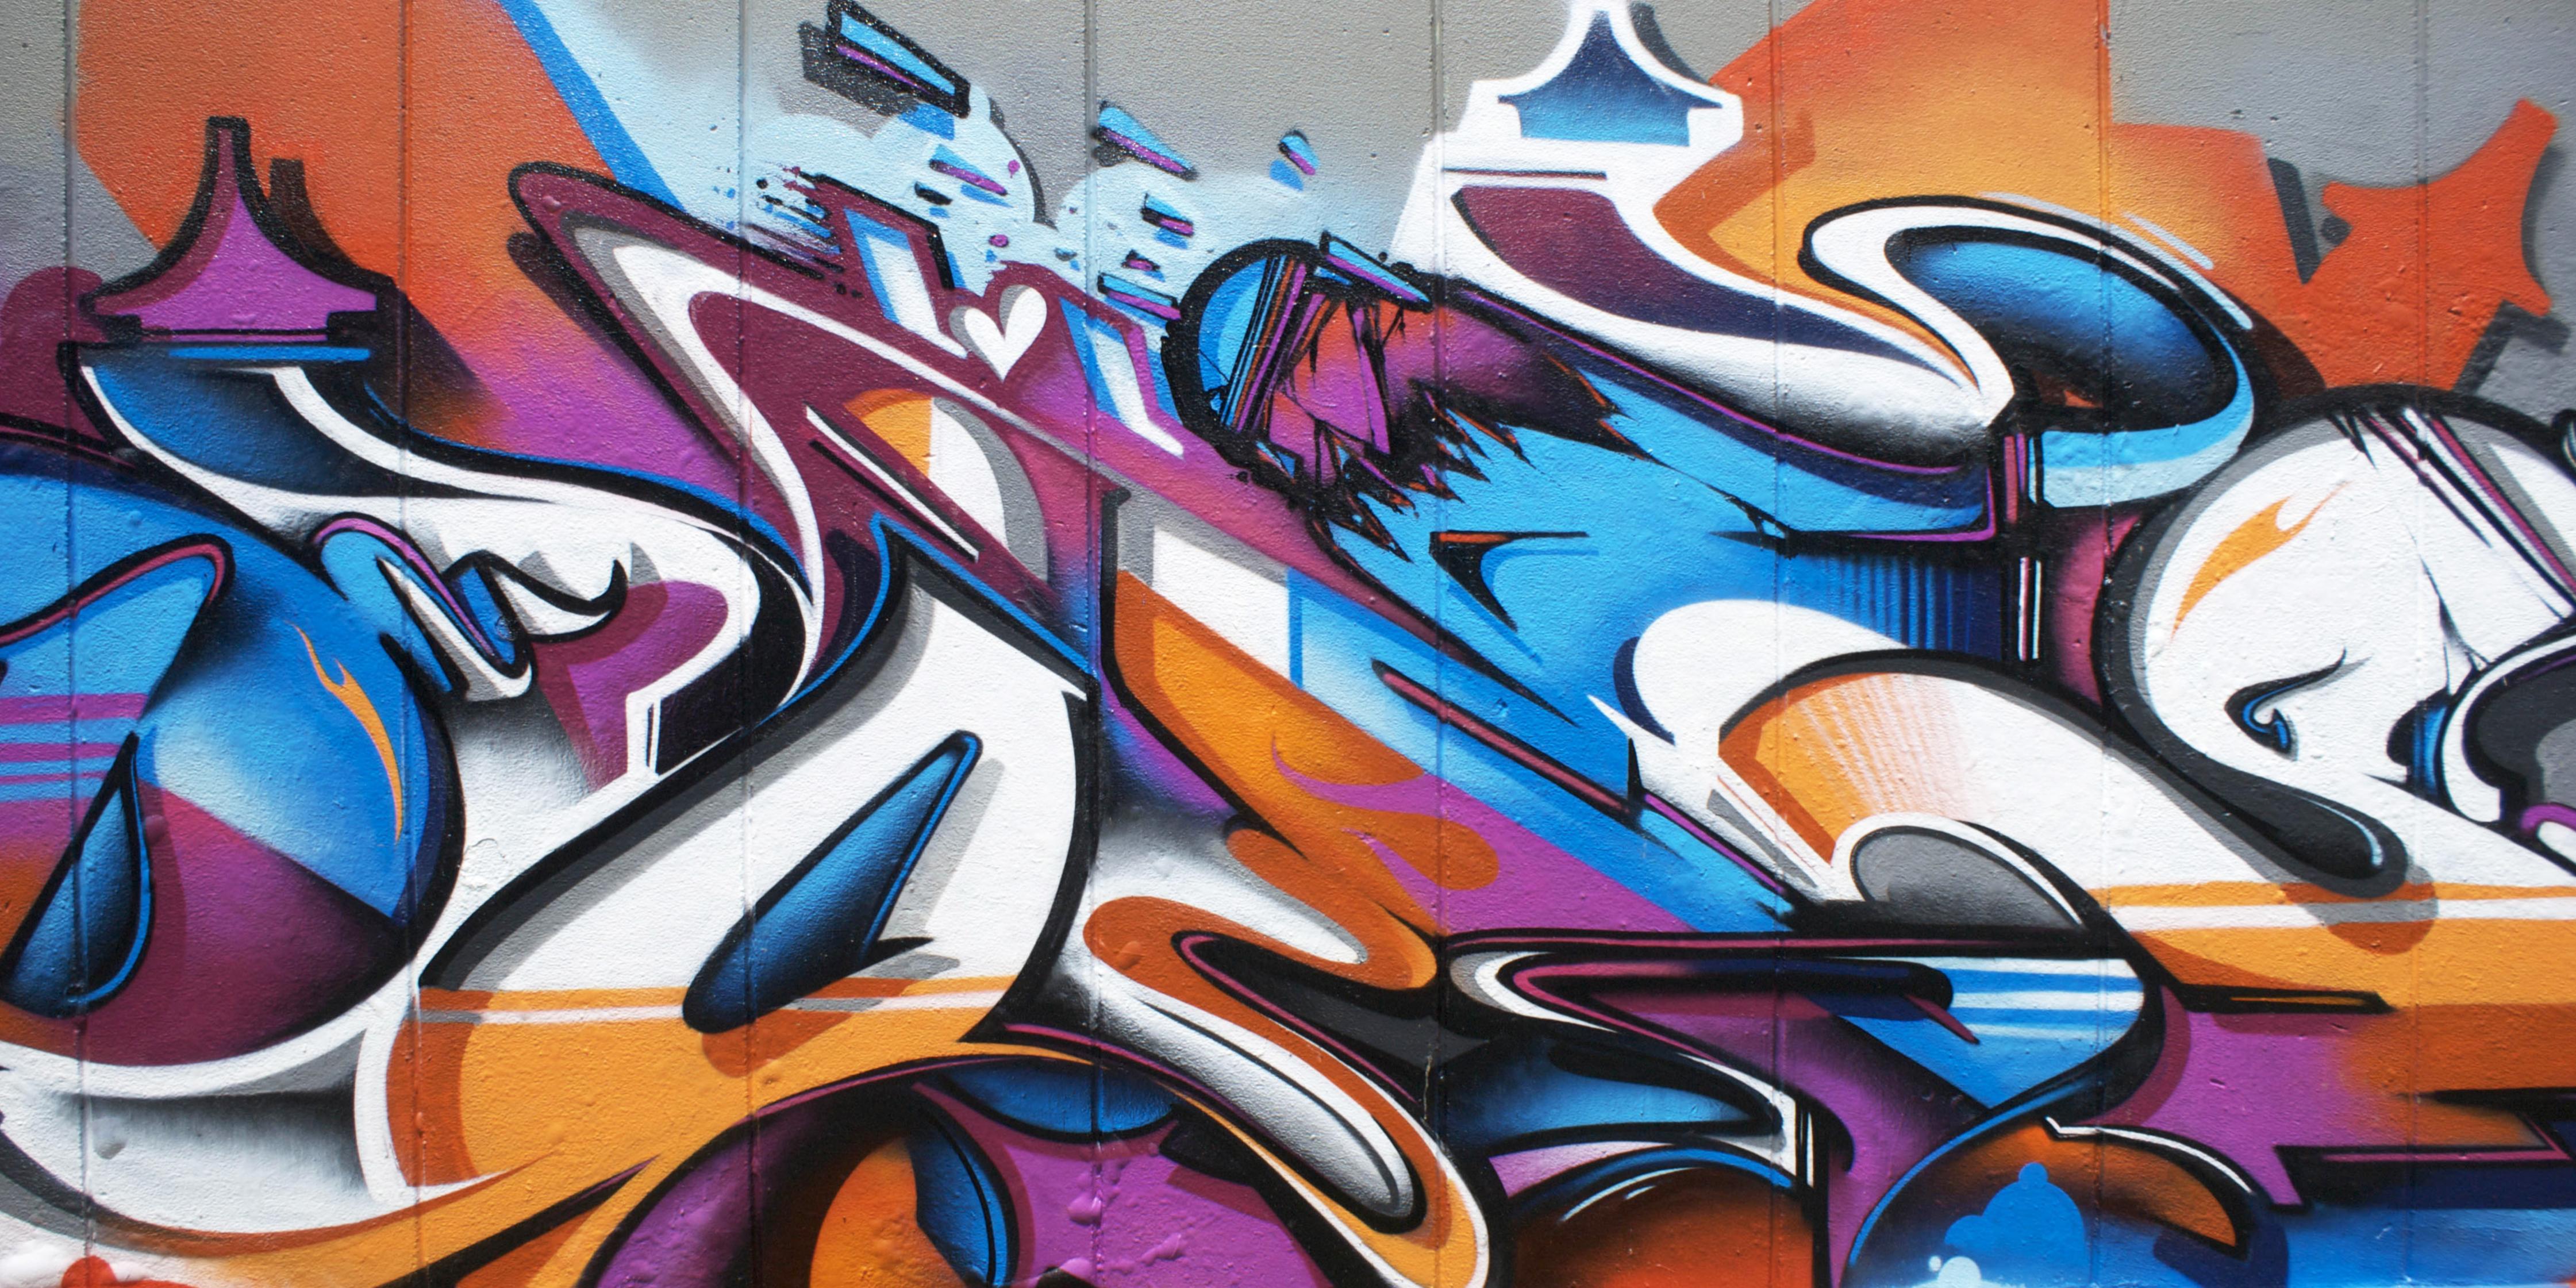 A work by Does - Byron Bay, Australia_thumb